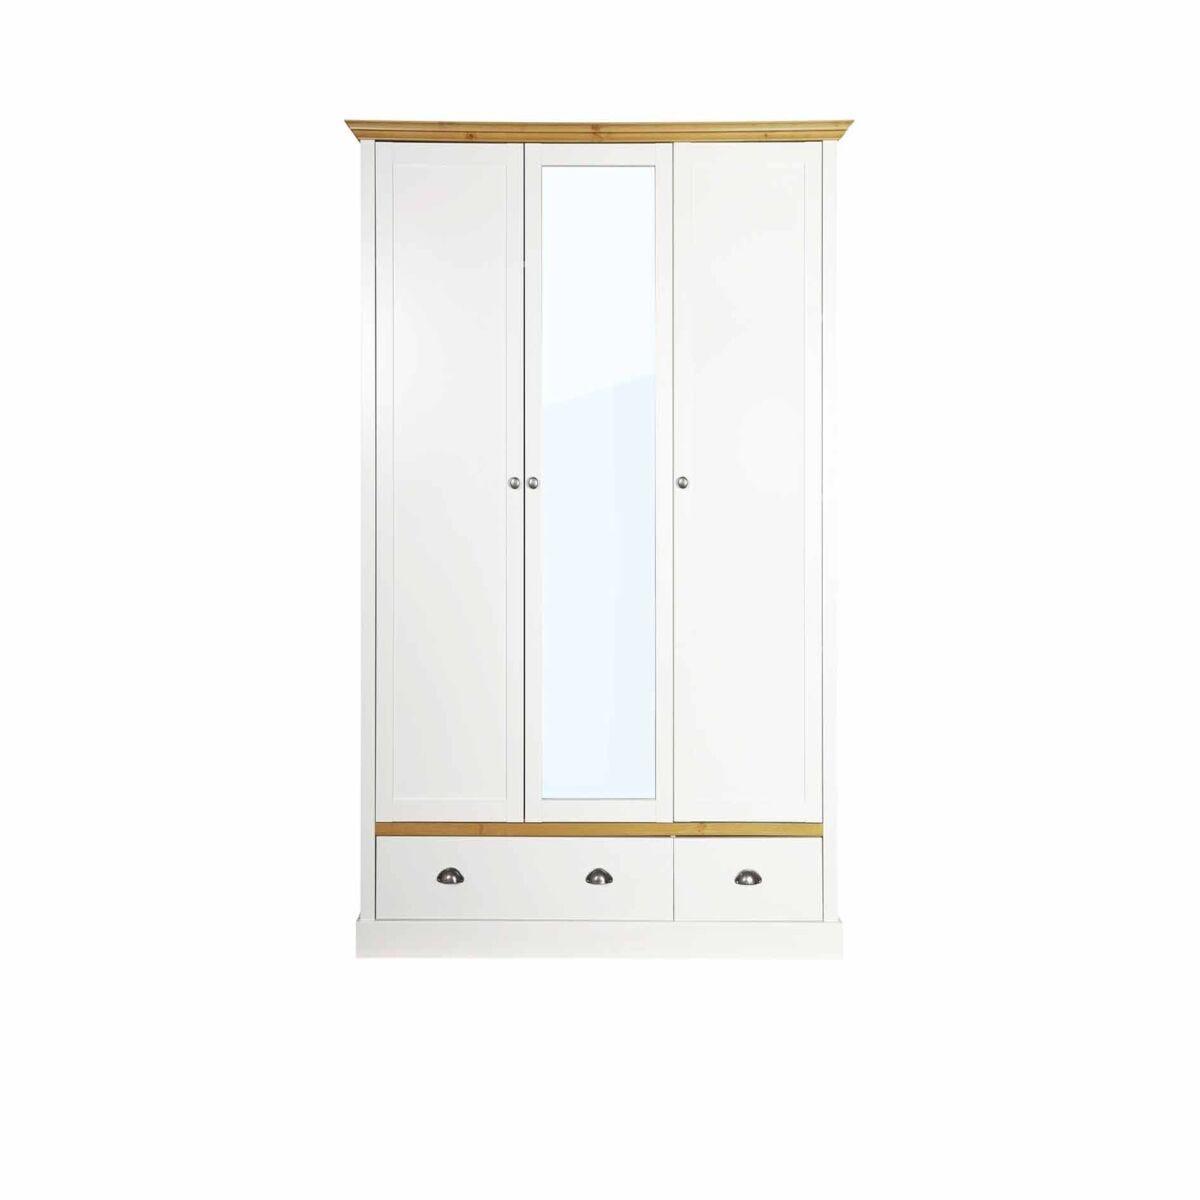 Steens Sandringham 3 Door 2 Drawer Mirrored Wardrobe